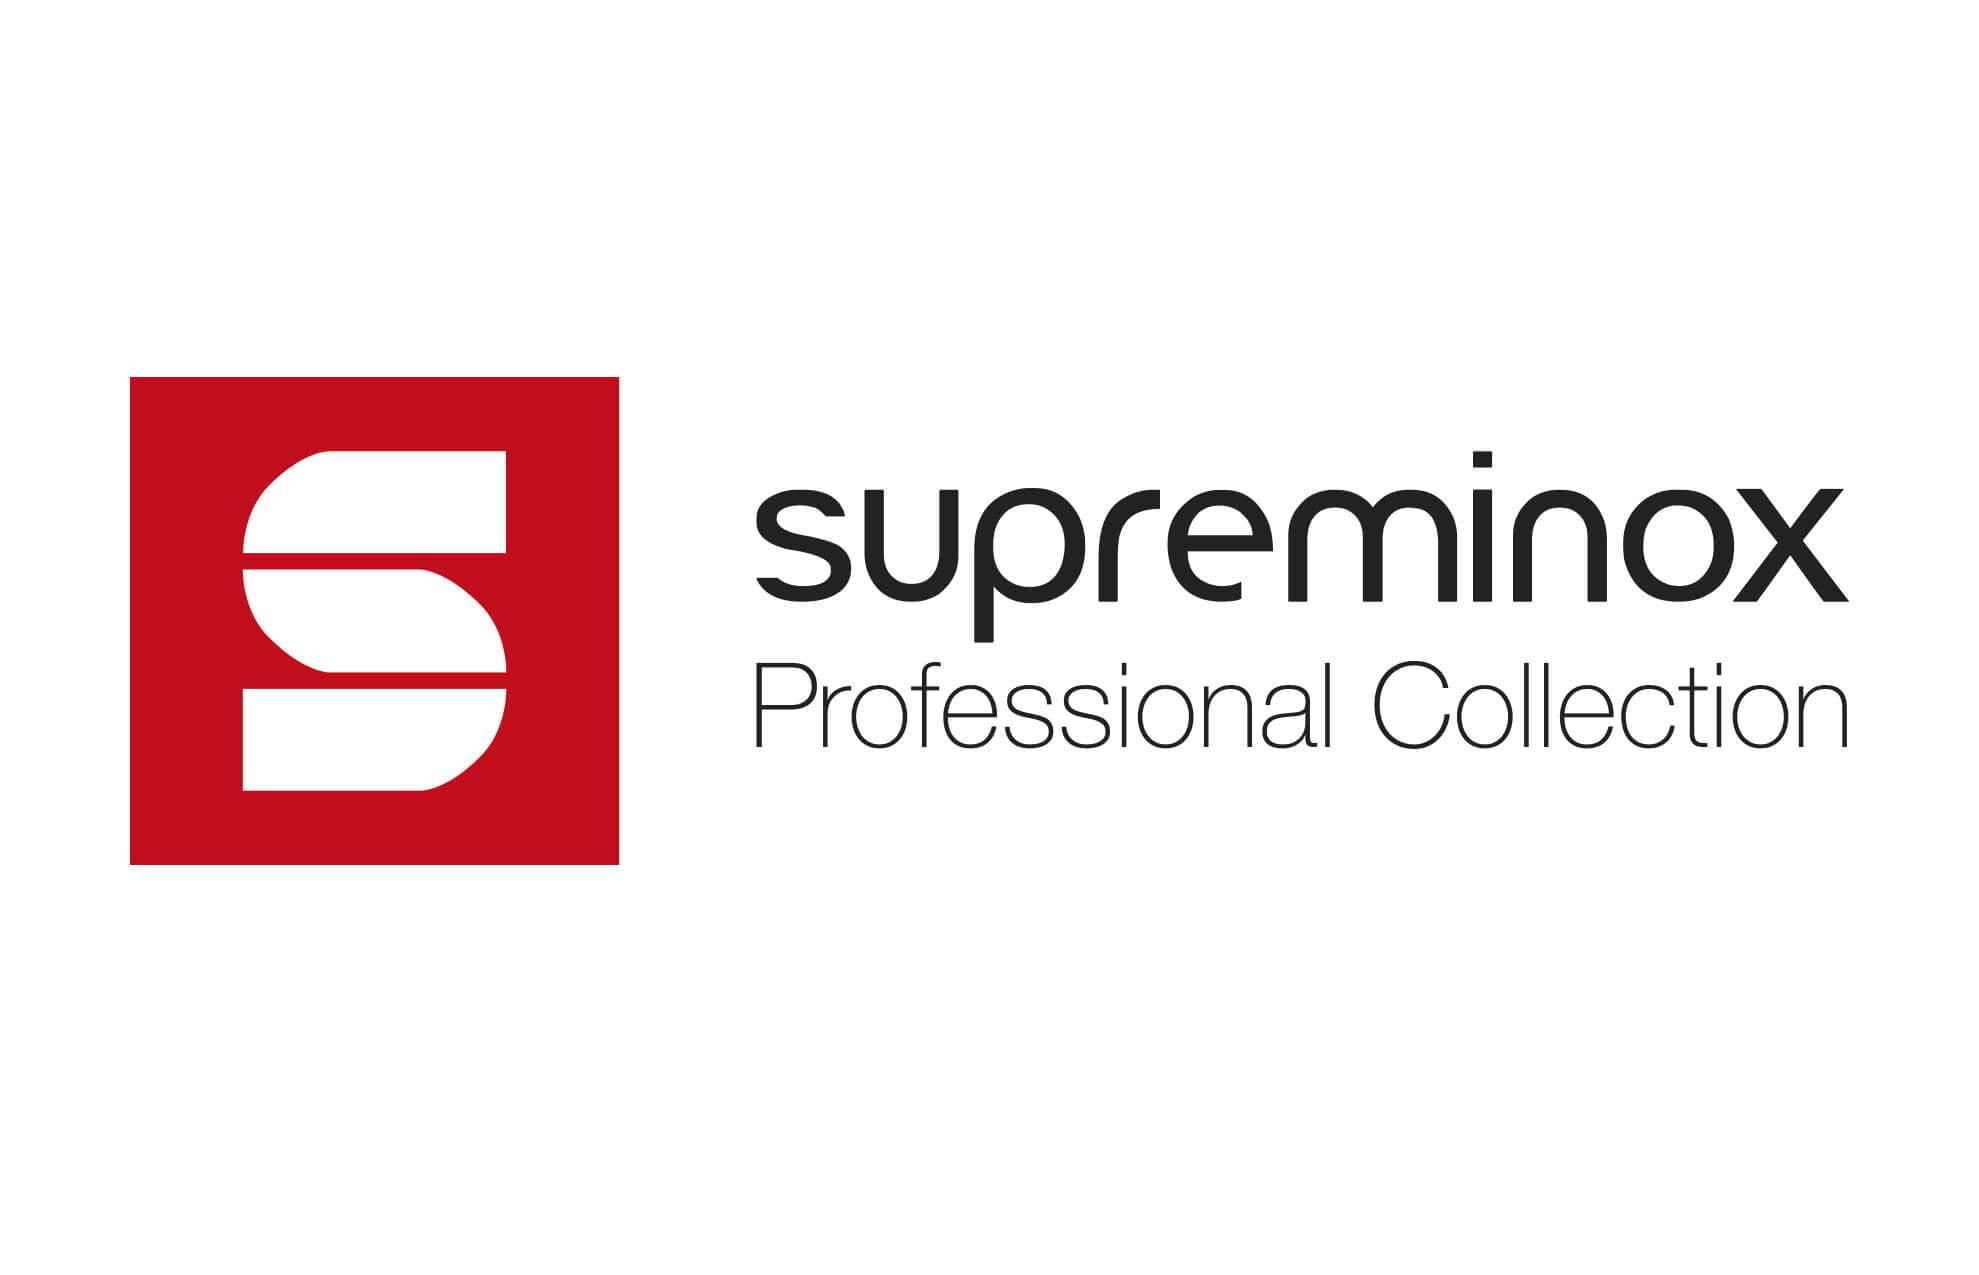 branding marca comunicacion submarca1 - Proyecto global. Branding. Packaging